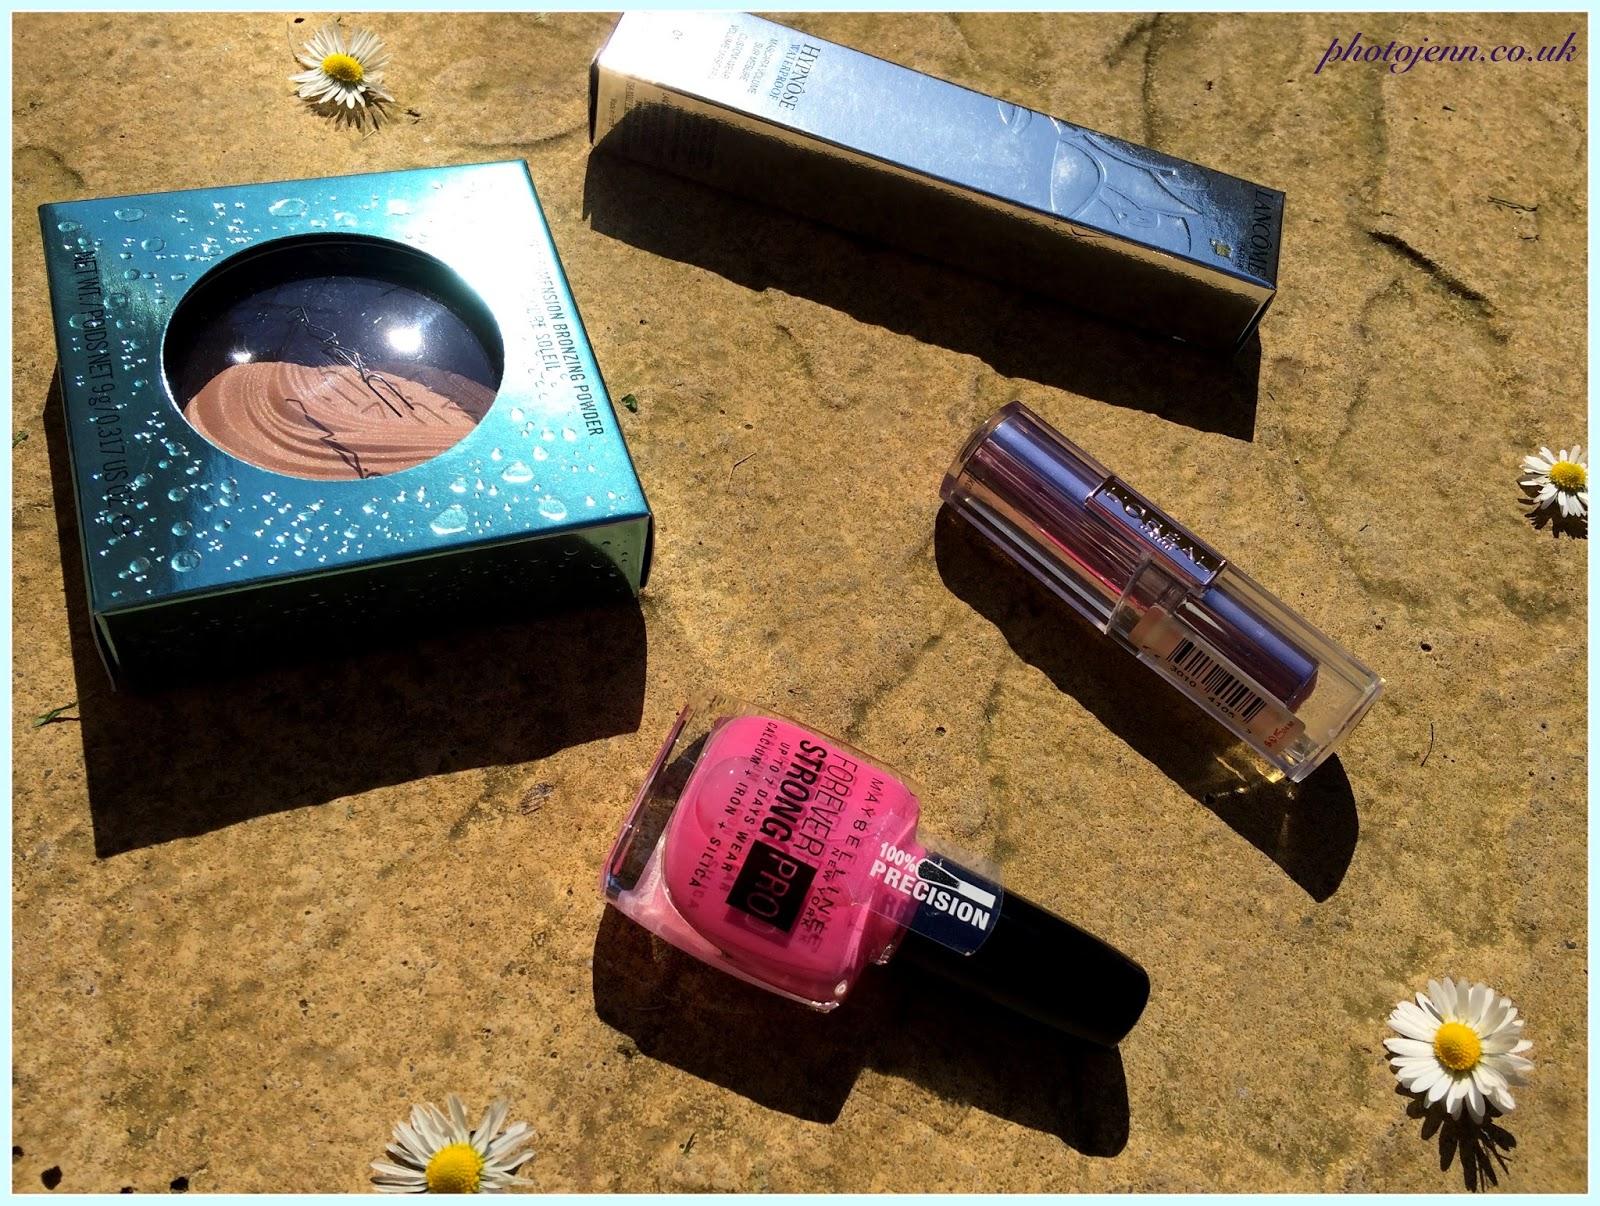 save-on-make-up-website-MAC-Lancome-Loreal-rouge-caresse-maybelline